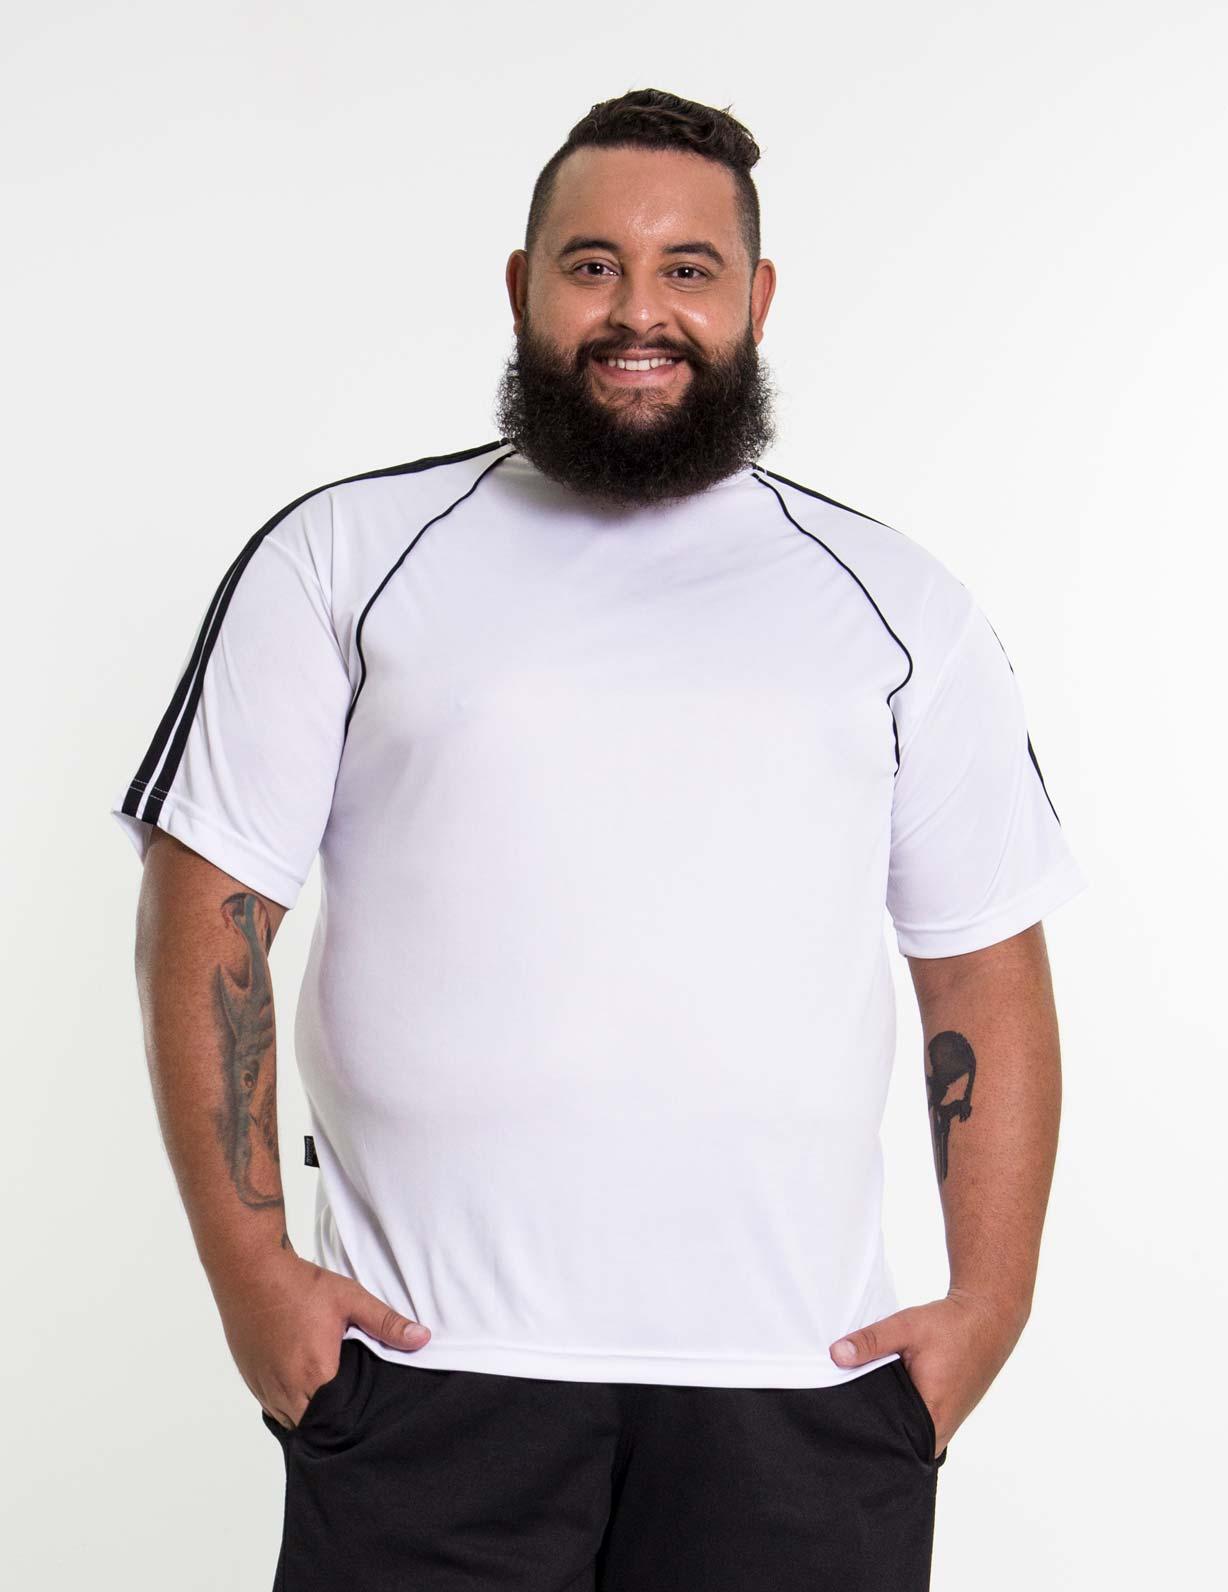 Camiseta Branca Plus Size Masculina - DRY FIT